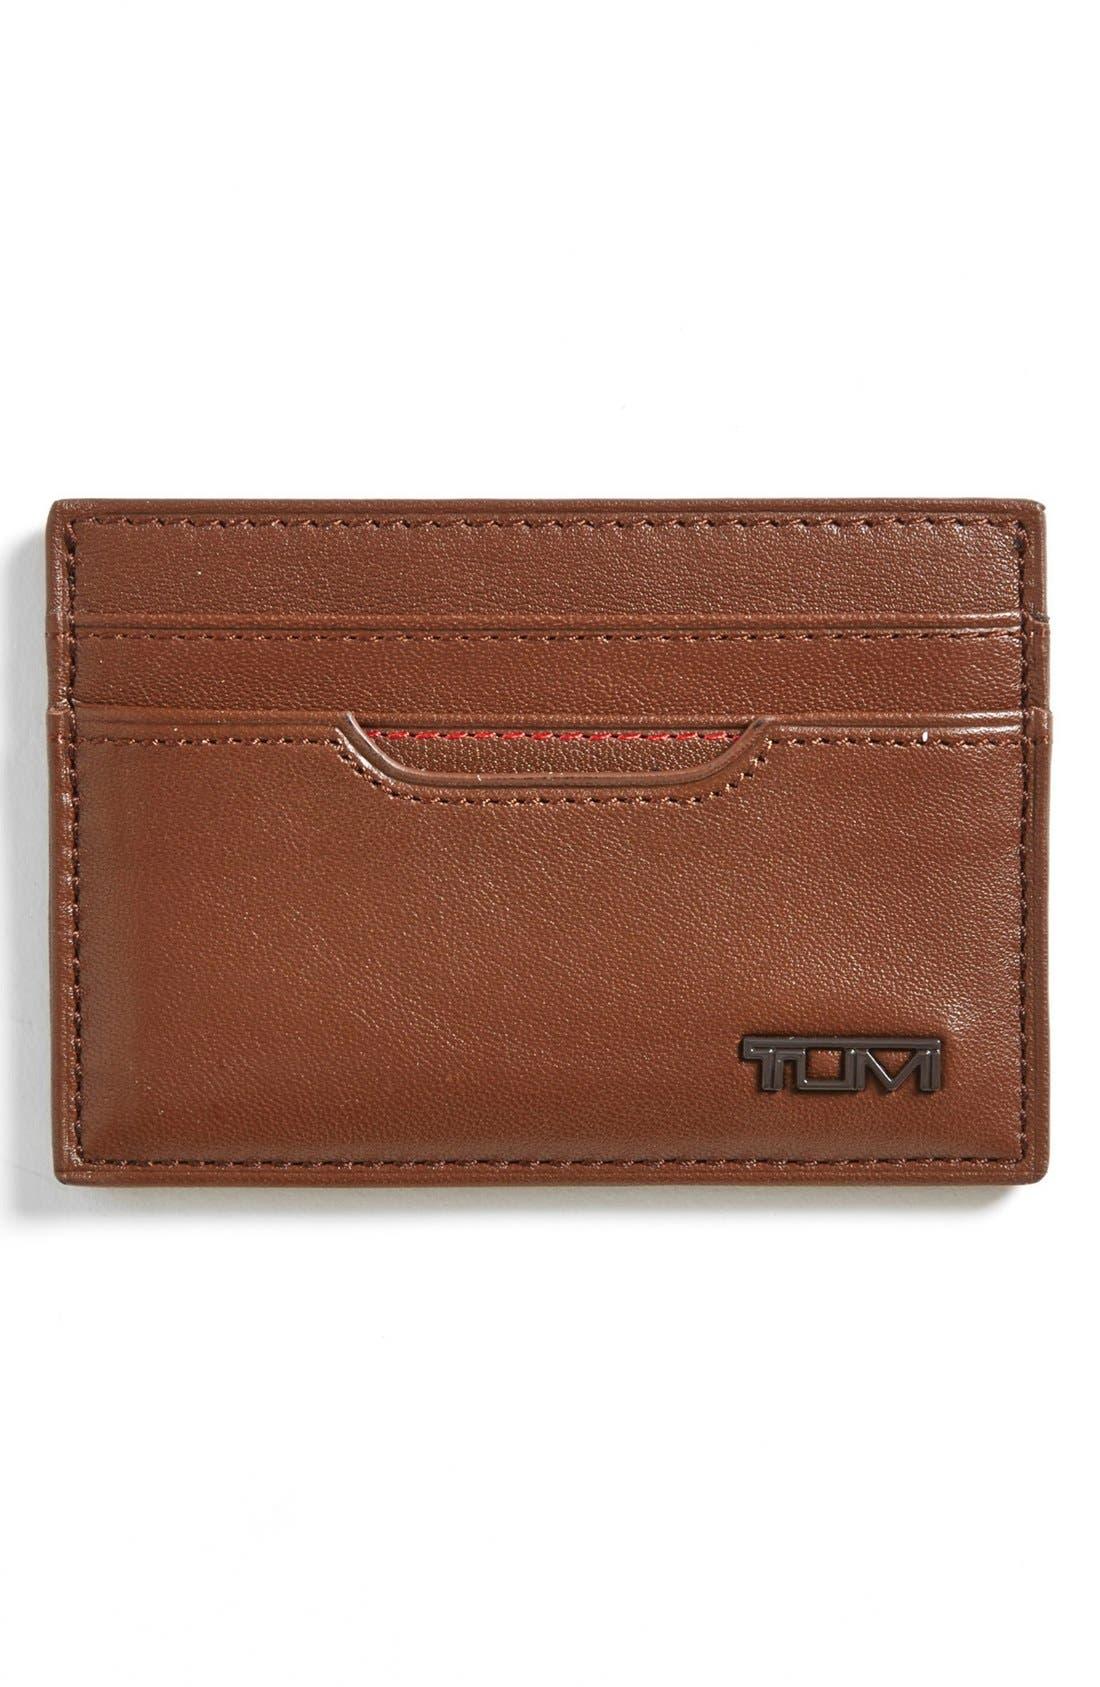 Alternate Image 1 Selected - Tumi 'Slim' Card Case ID Wallet